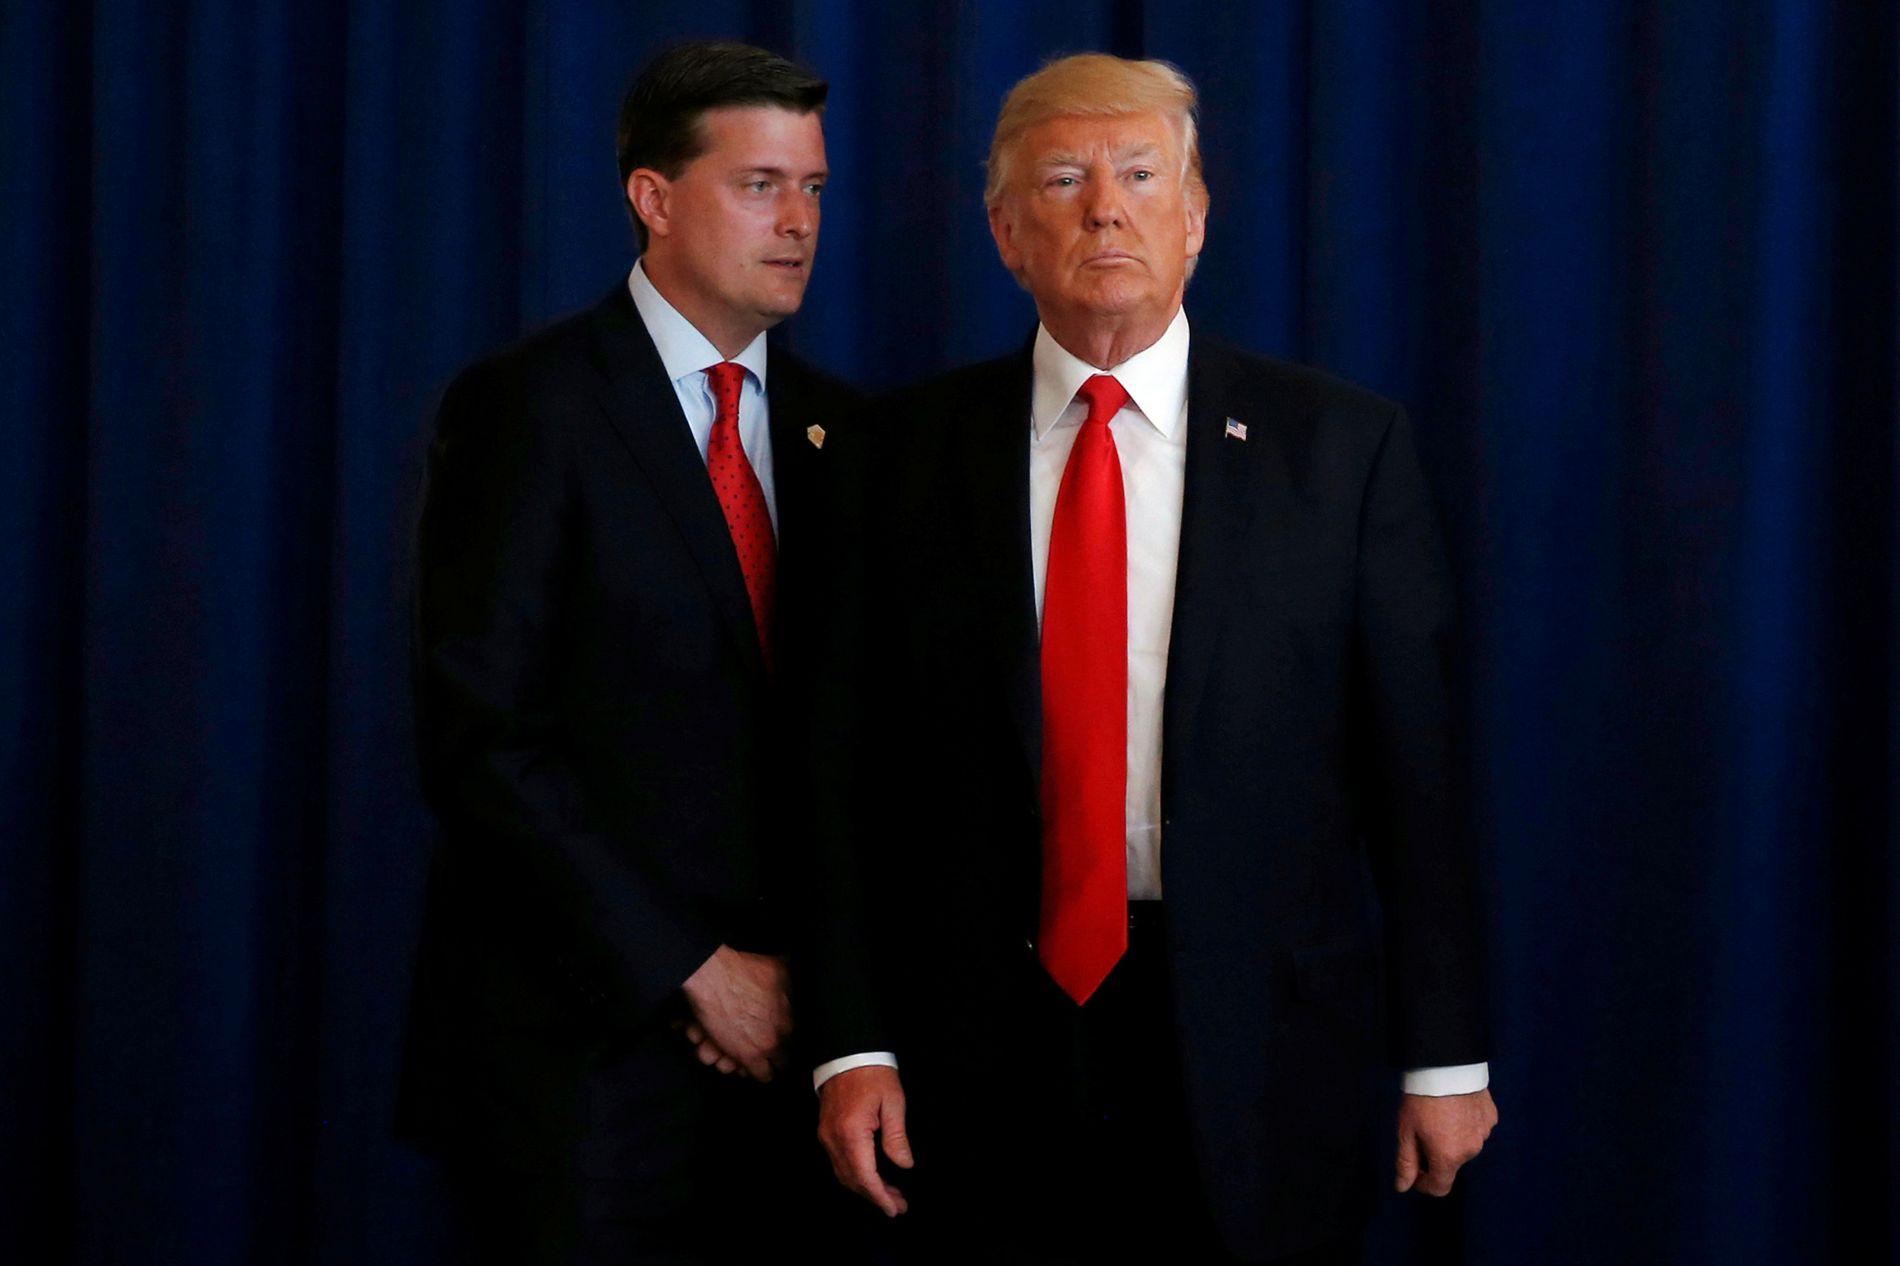 SKILTE LAG: Rob Porter var sekretær for Donald Trumps stab i Det hvite hus. Her er de sammen i august 2017.